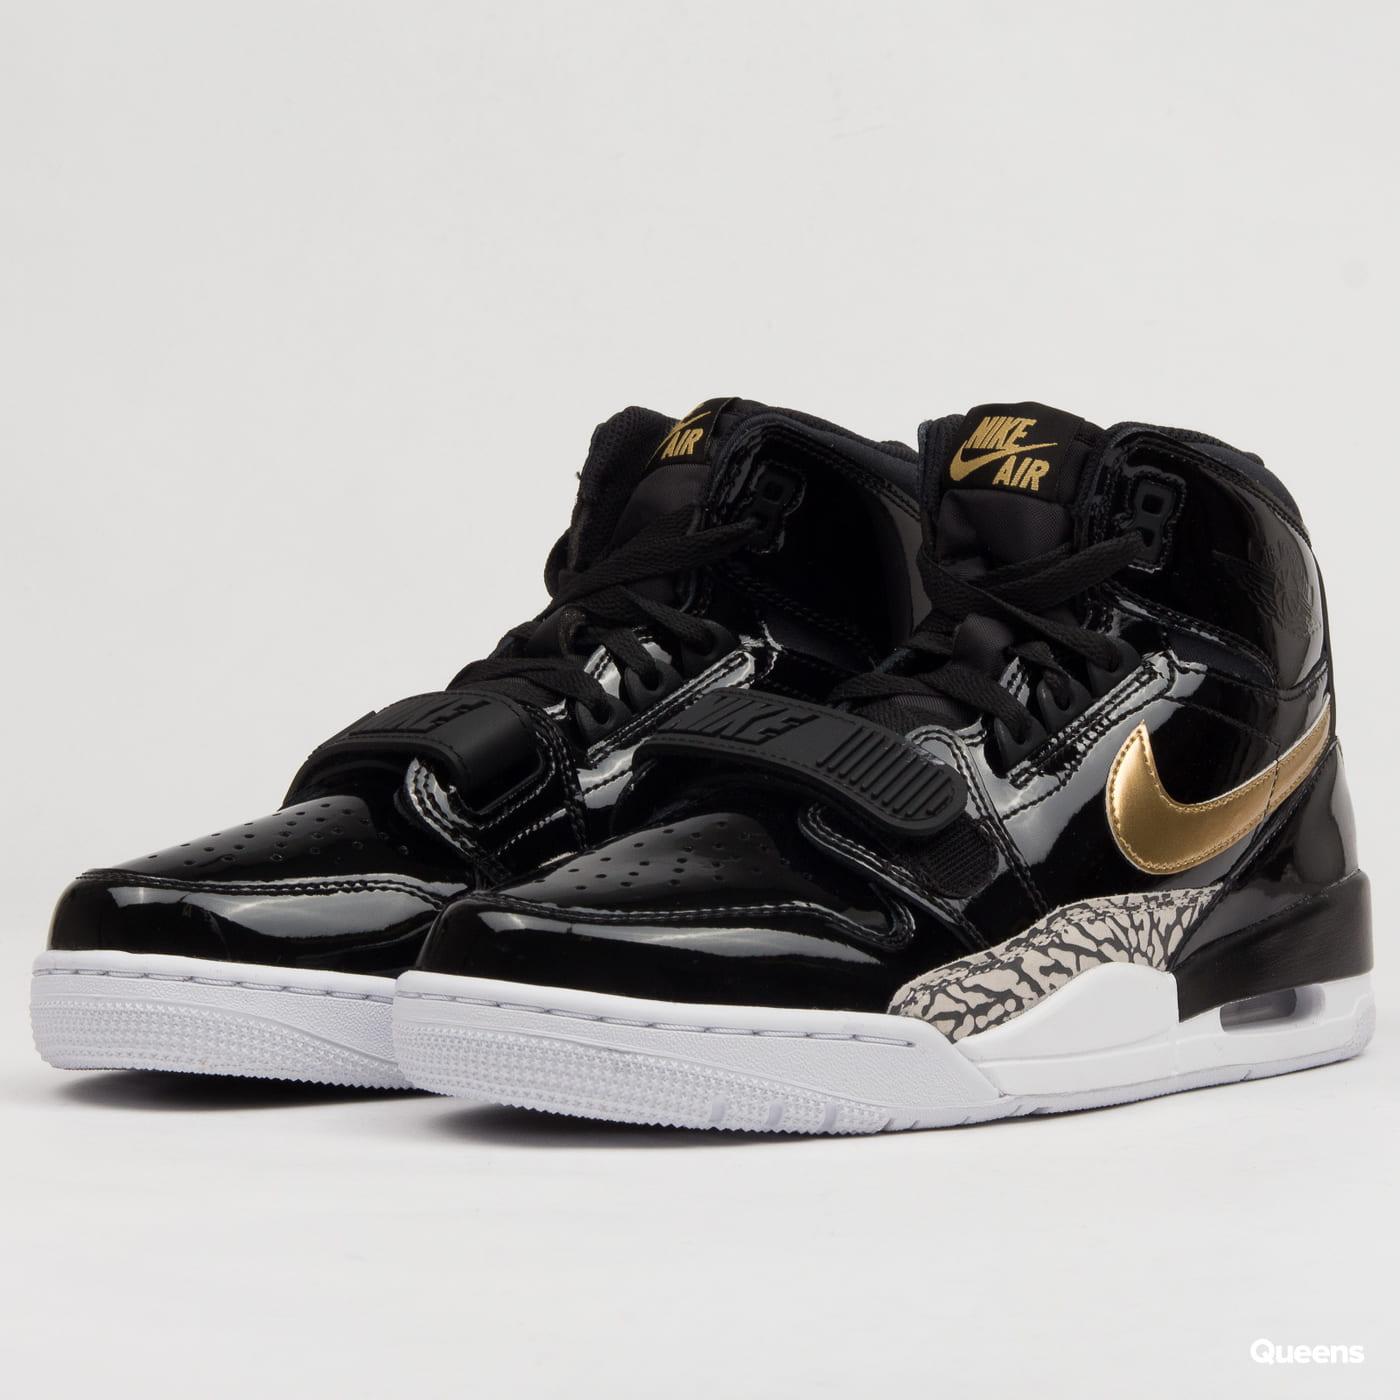 new arrival 49823 ebe63 Sneakers Jordan Air Jordan Legacy 312 (AV3922-007)– Queens 💚